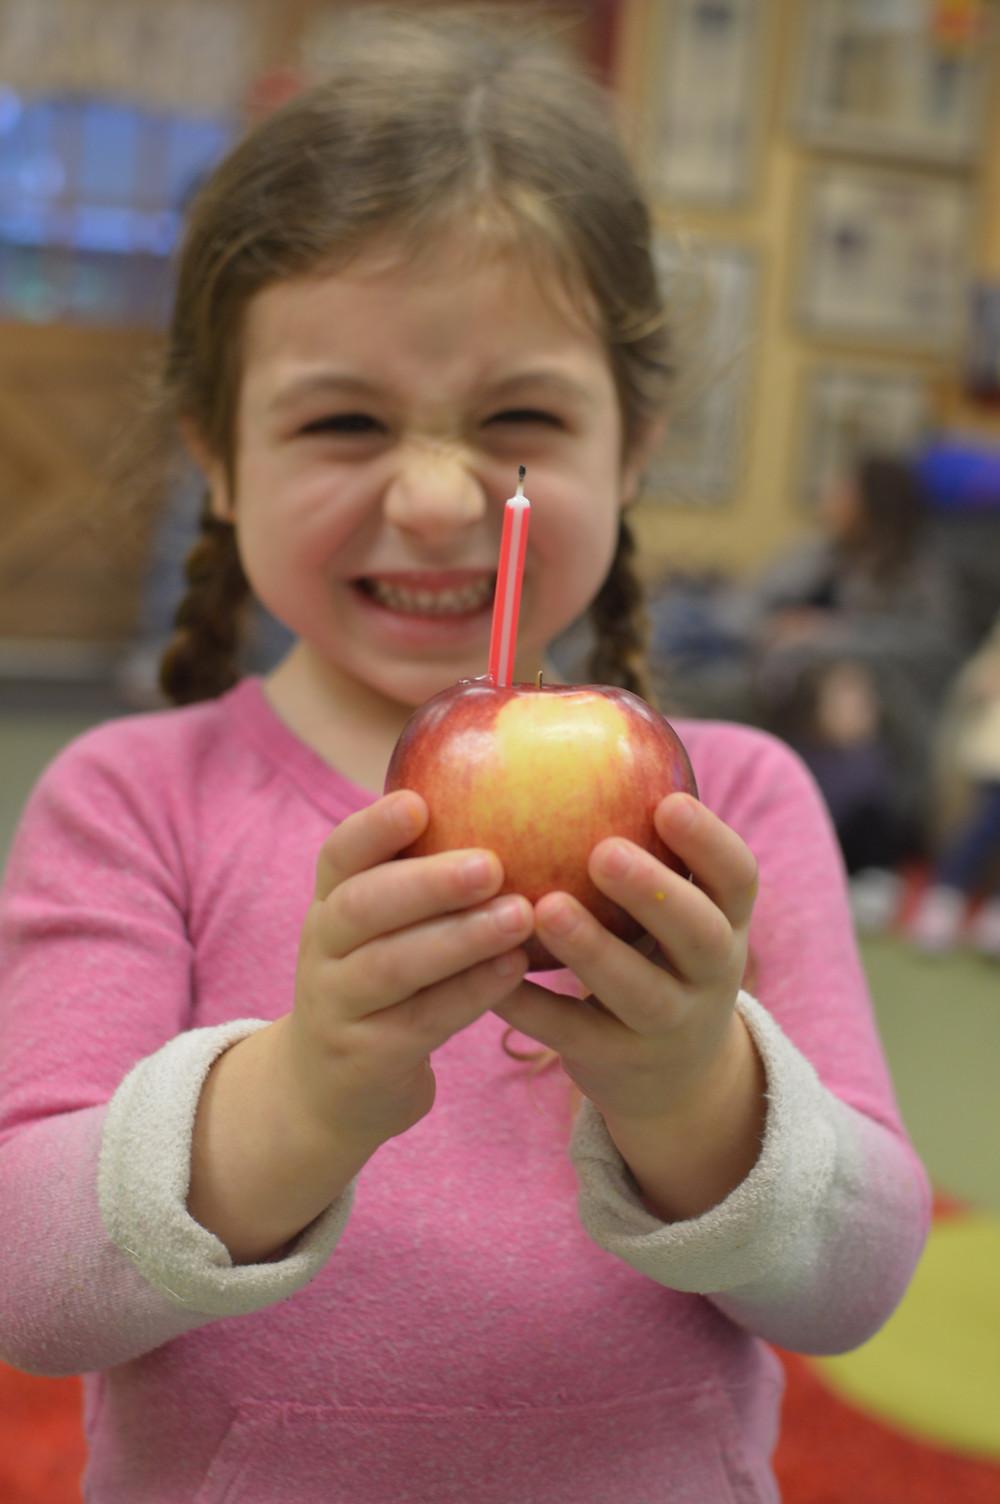 School Birthday Party Ideas By Stacey Antine, Ridgewood Moms